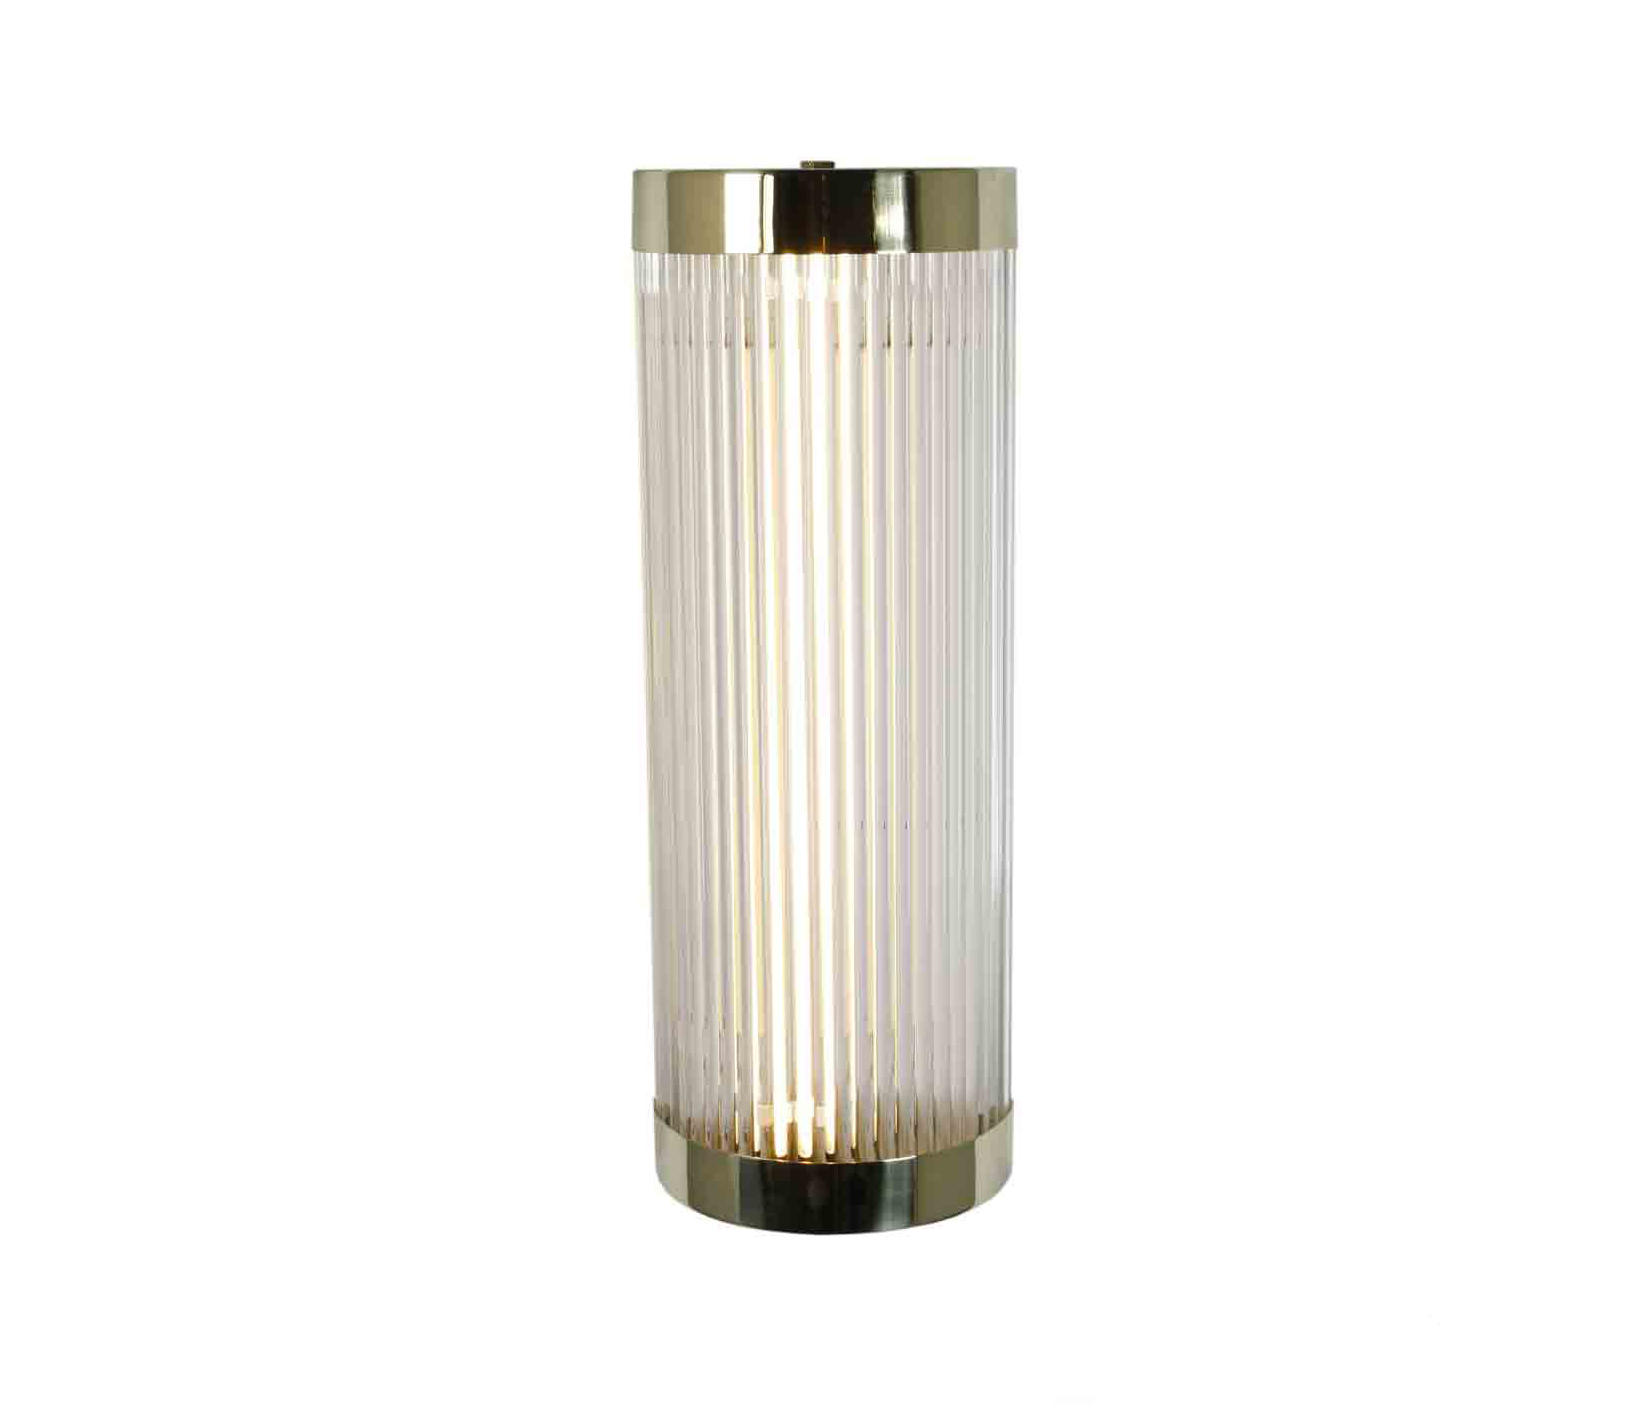 Pillar Led Wall Light 40 15cm Polished Br By Original Btc